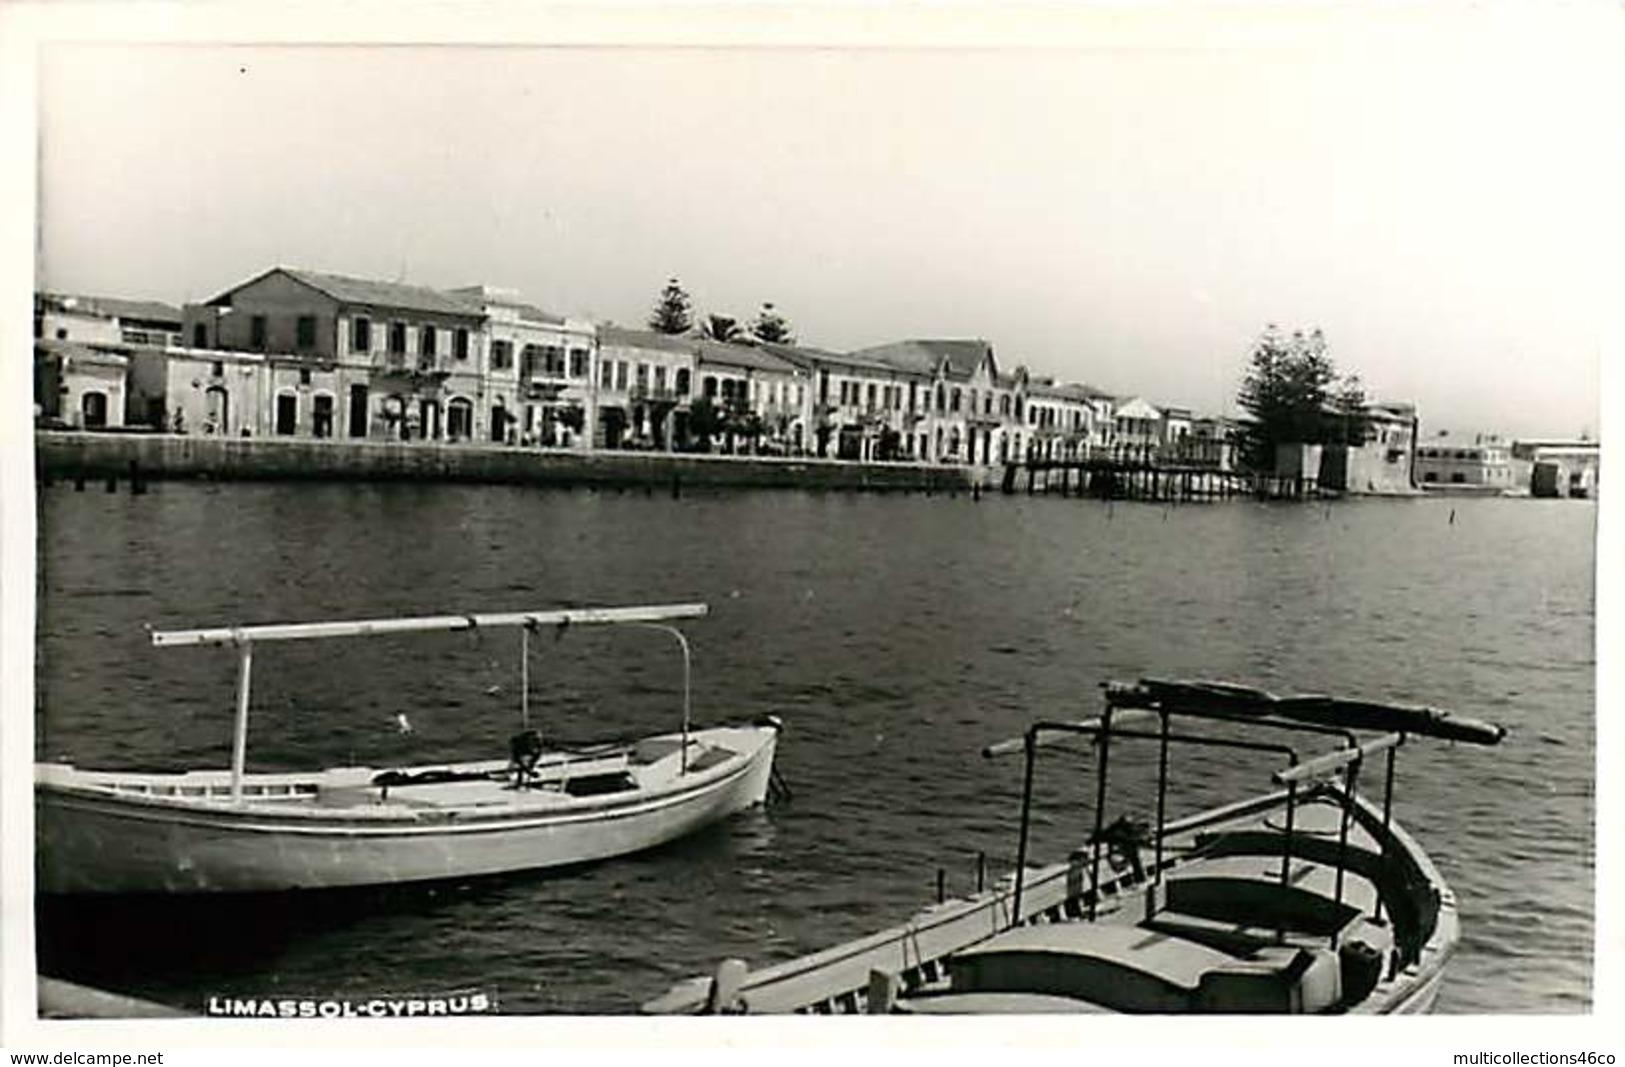 221118 - CHYPRE Limassol Cyprus - Barque Port - Cyprus